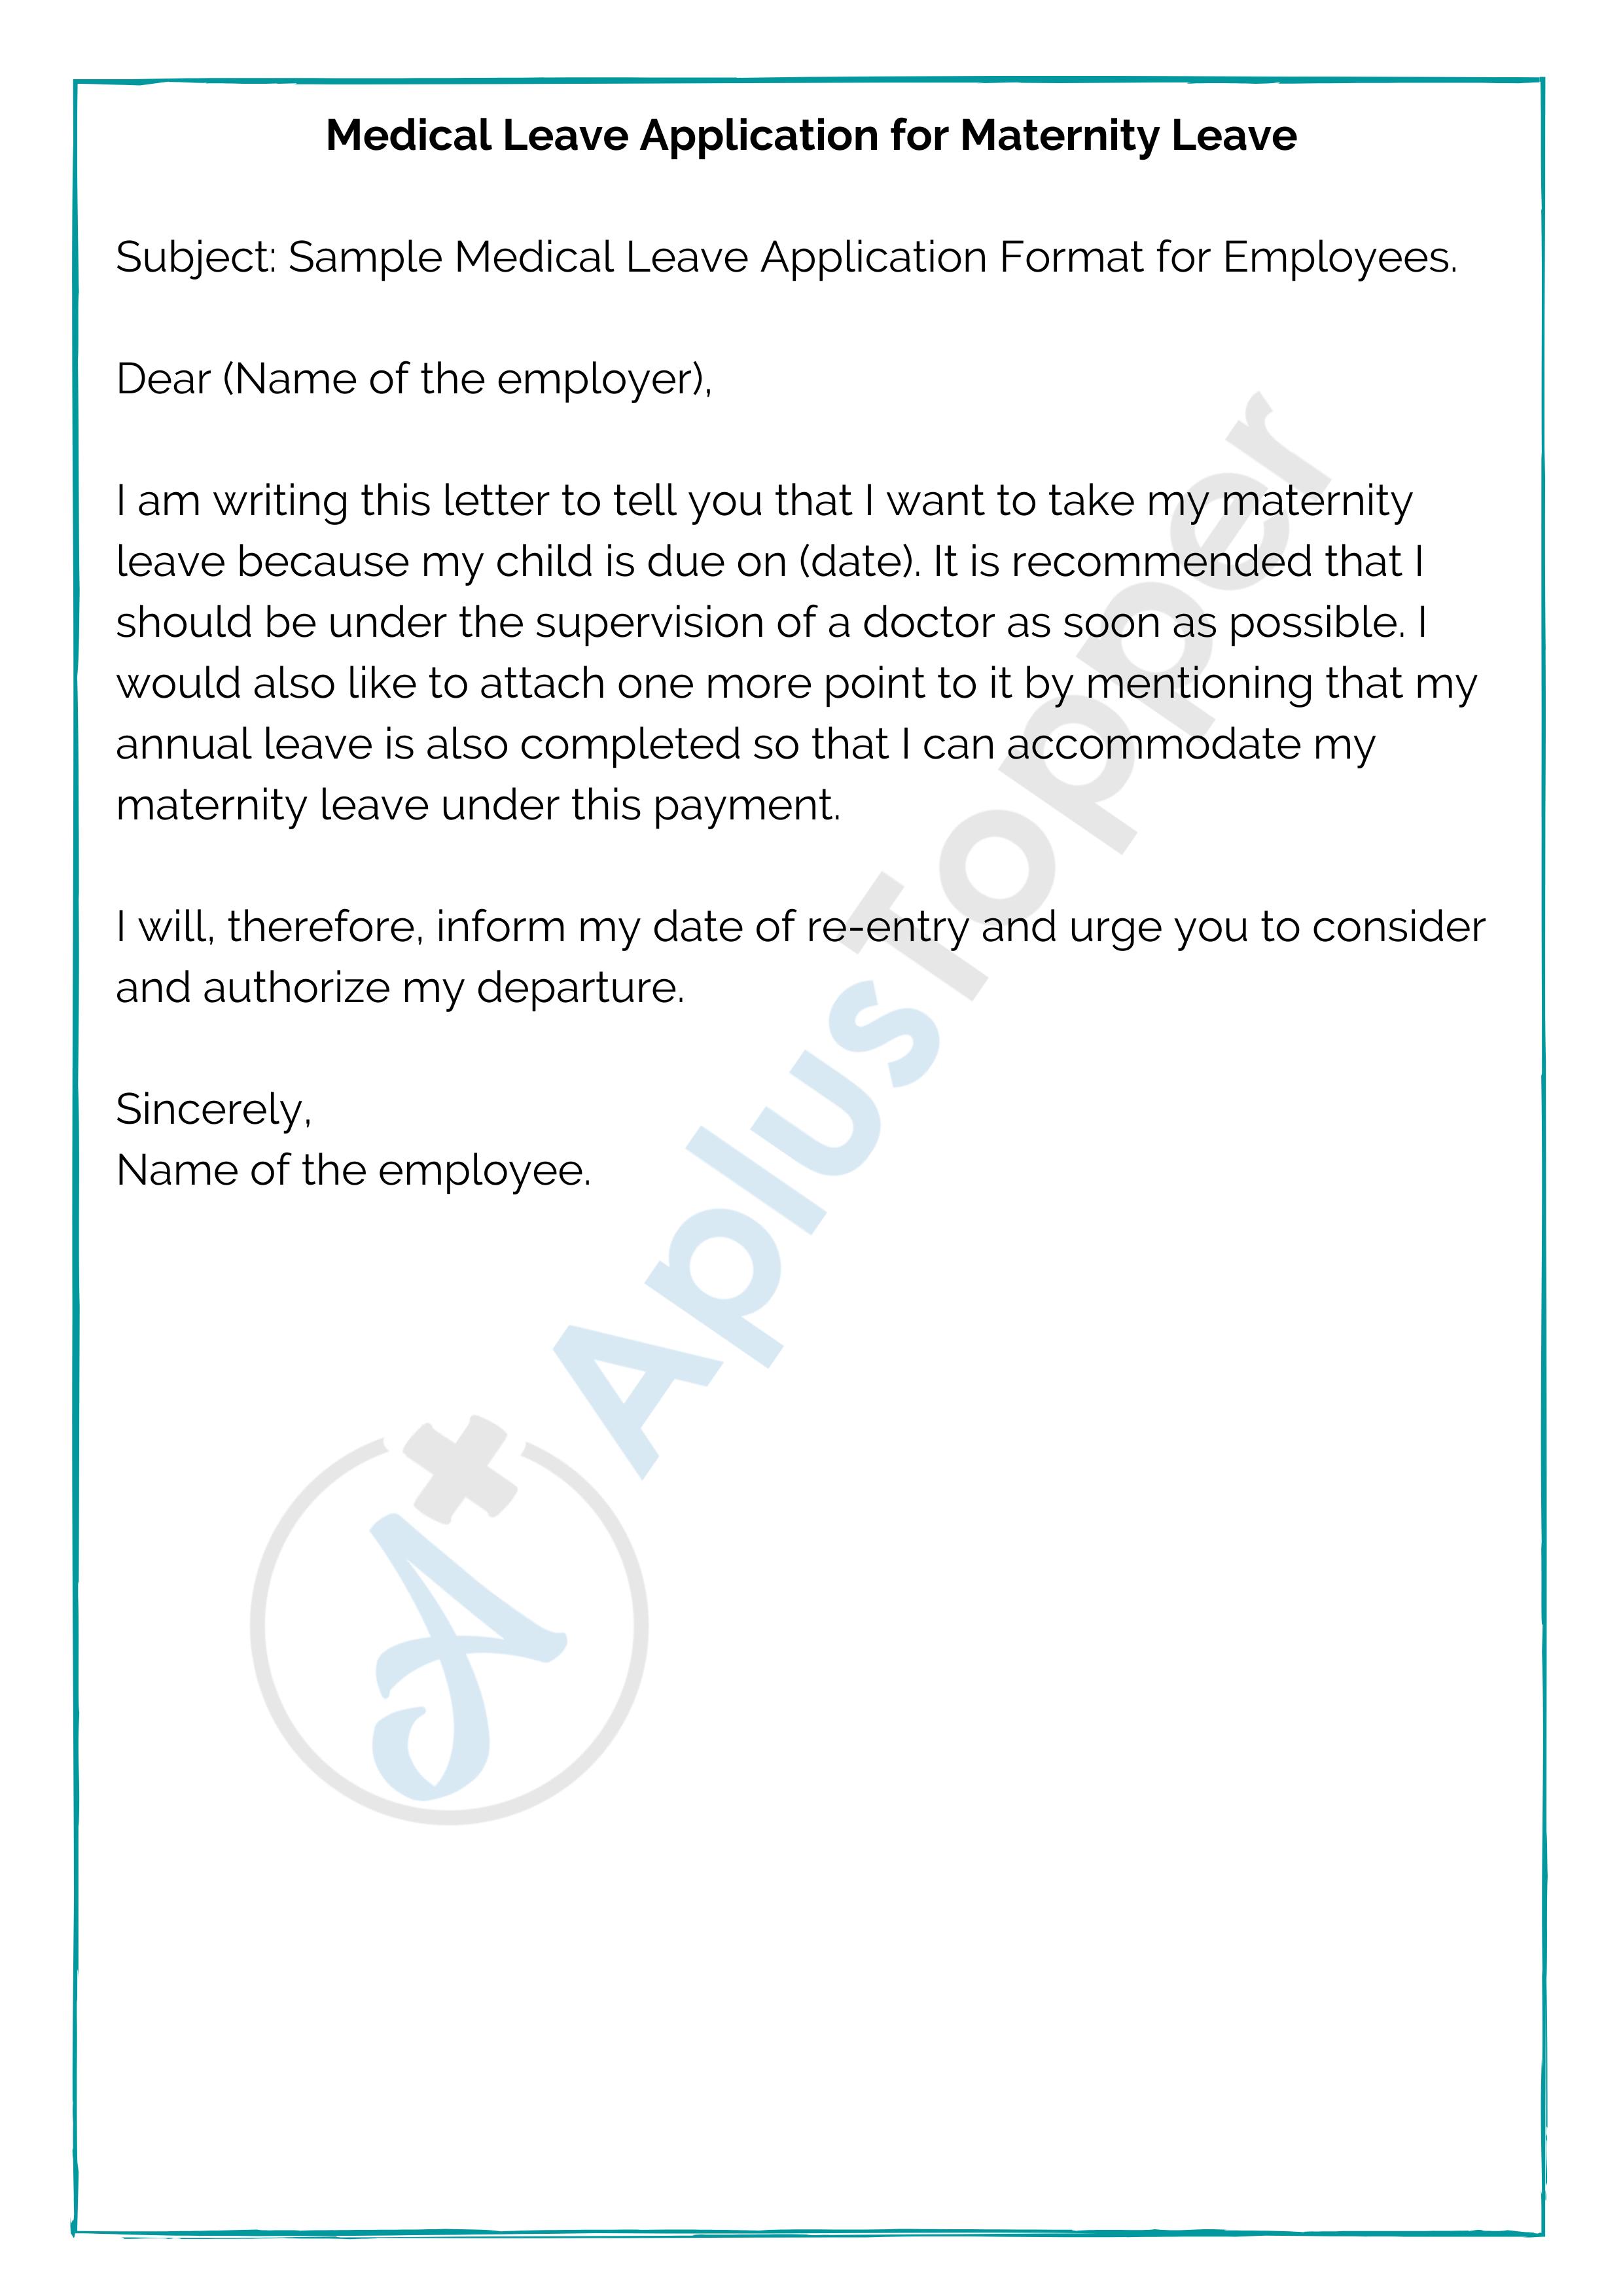 Medical Leave Application for Maternity Leave